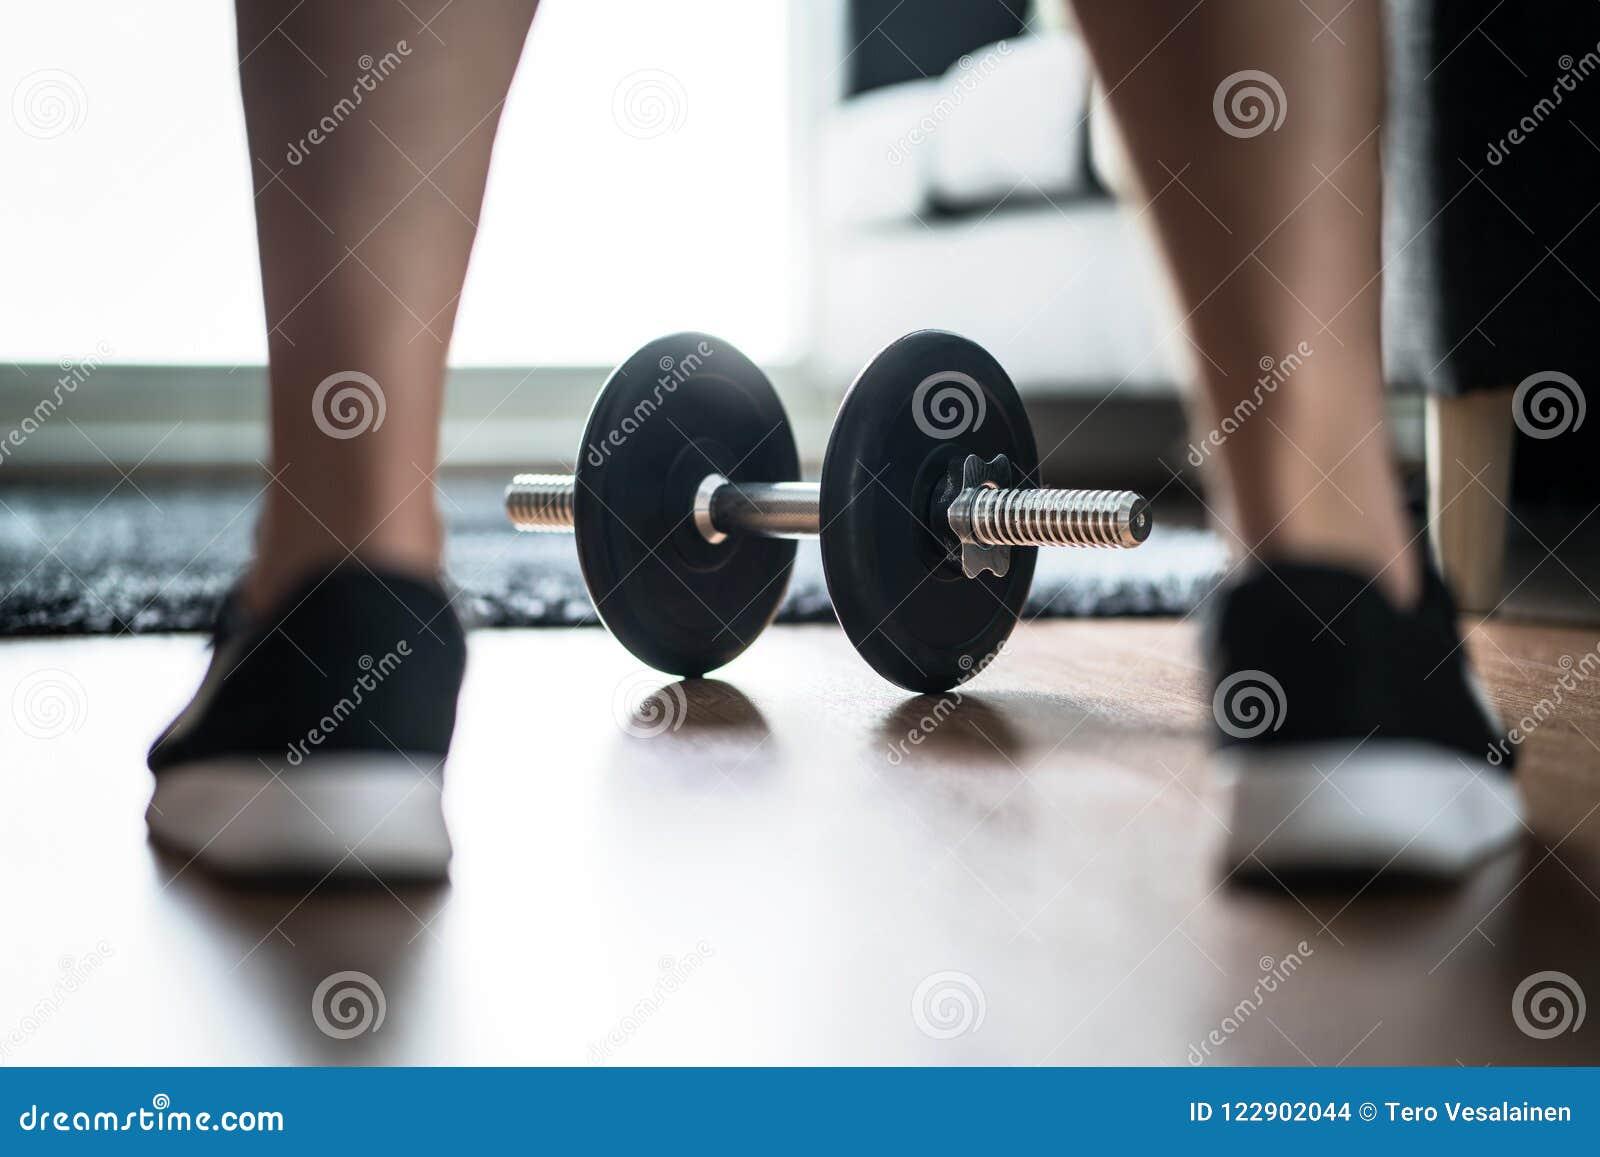 Fitness motivation, determination and challenge concept